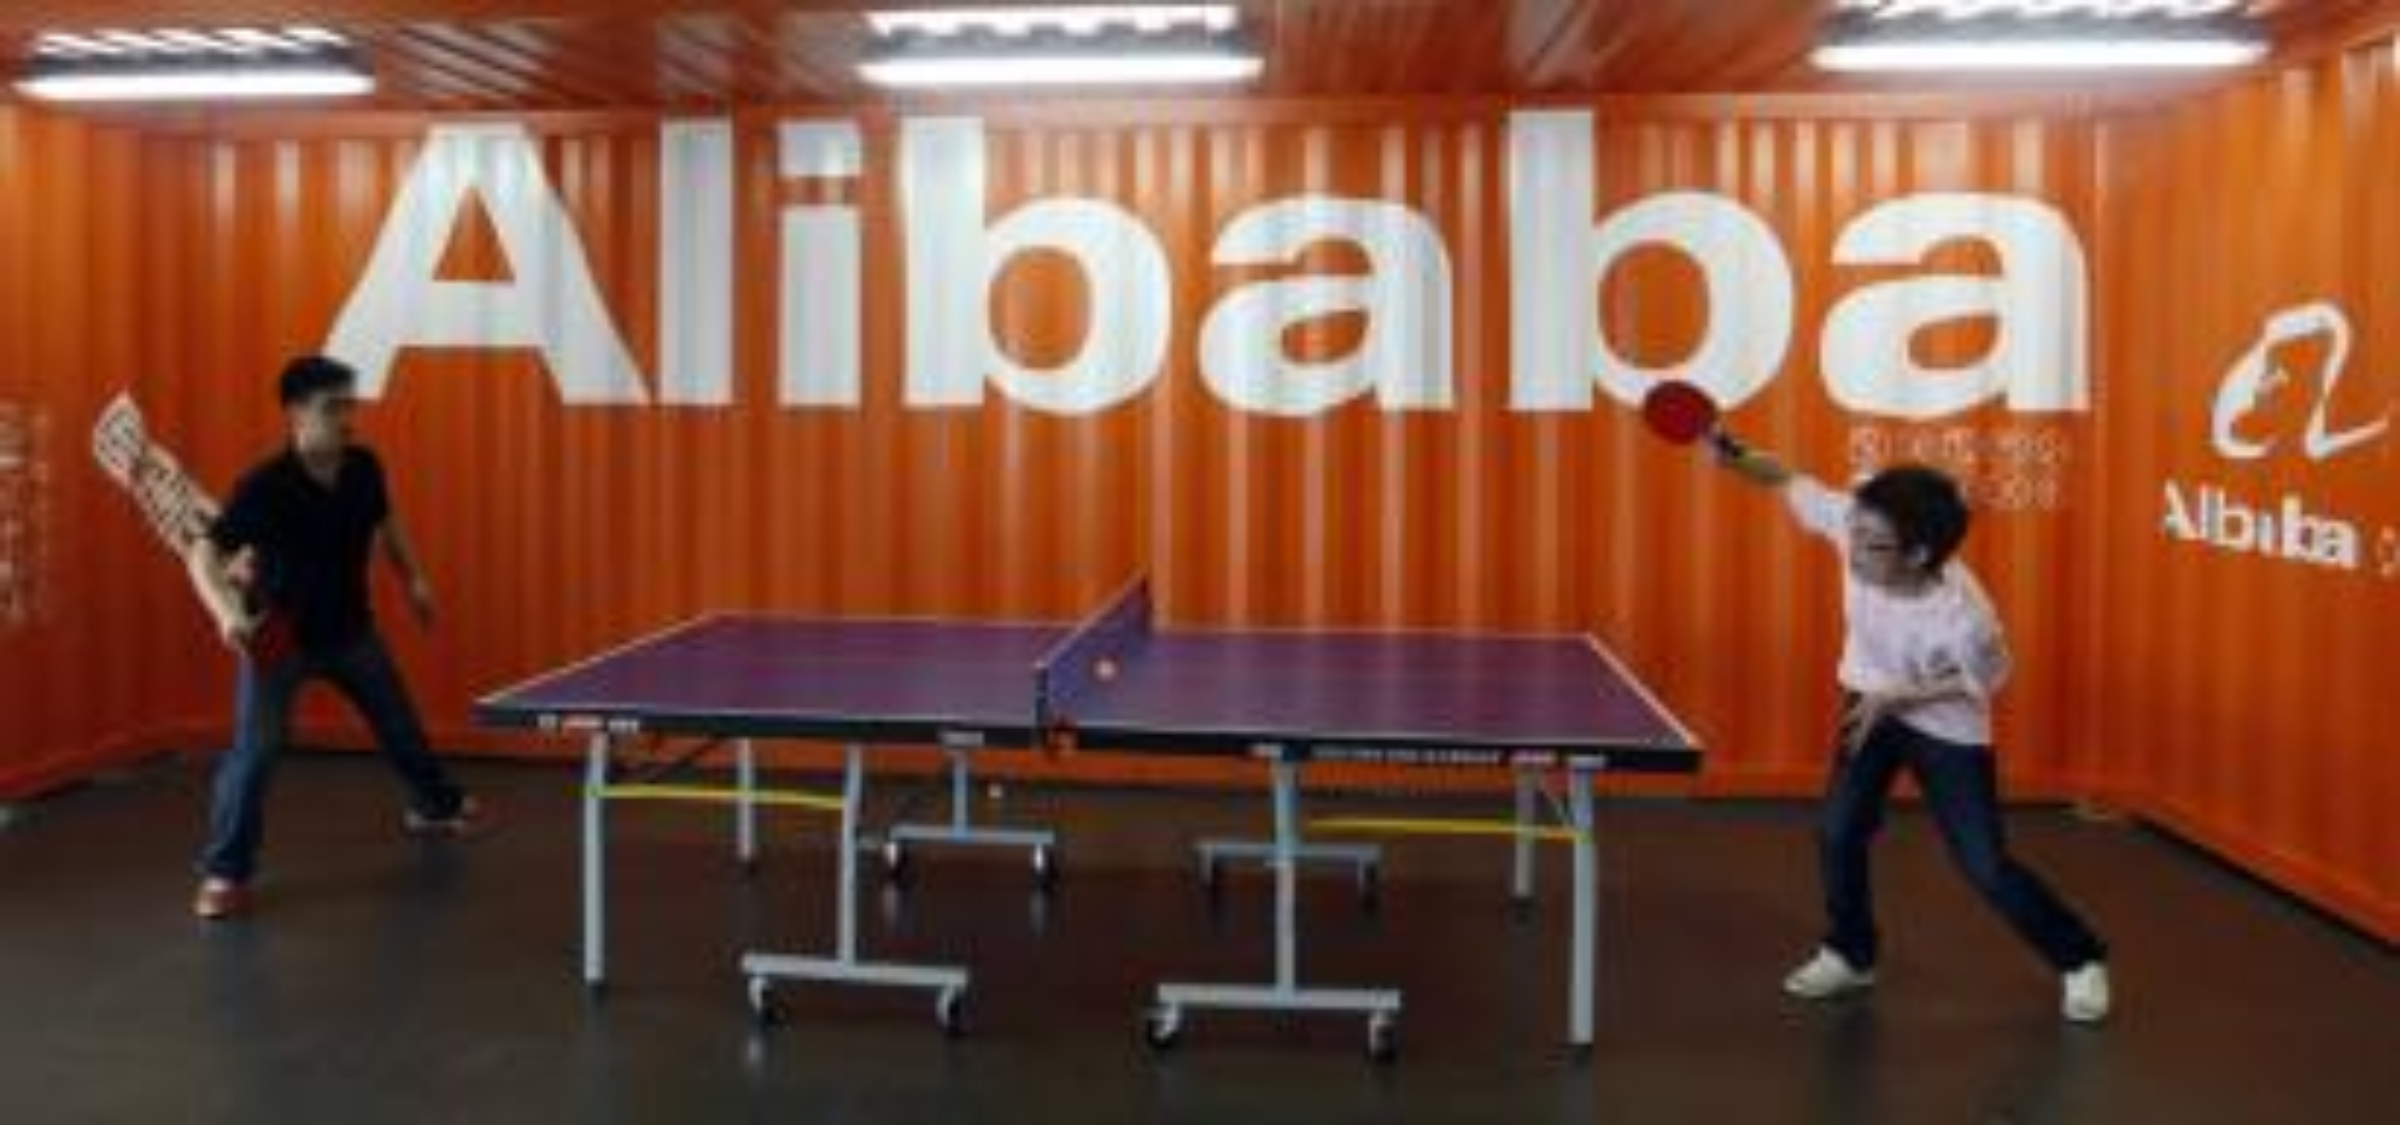 Alibaba employees play ping pong